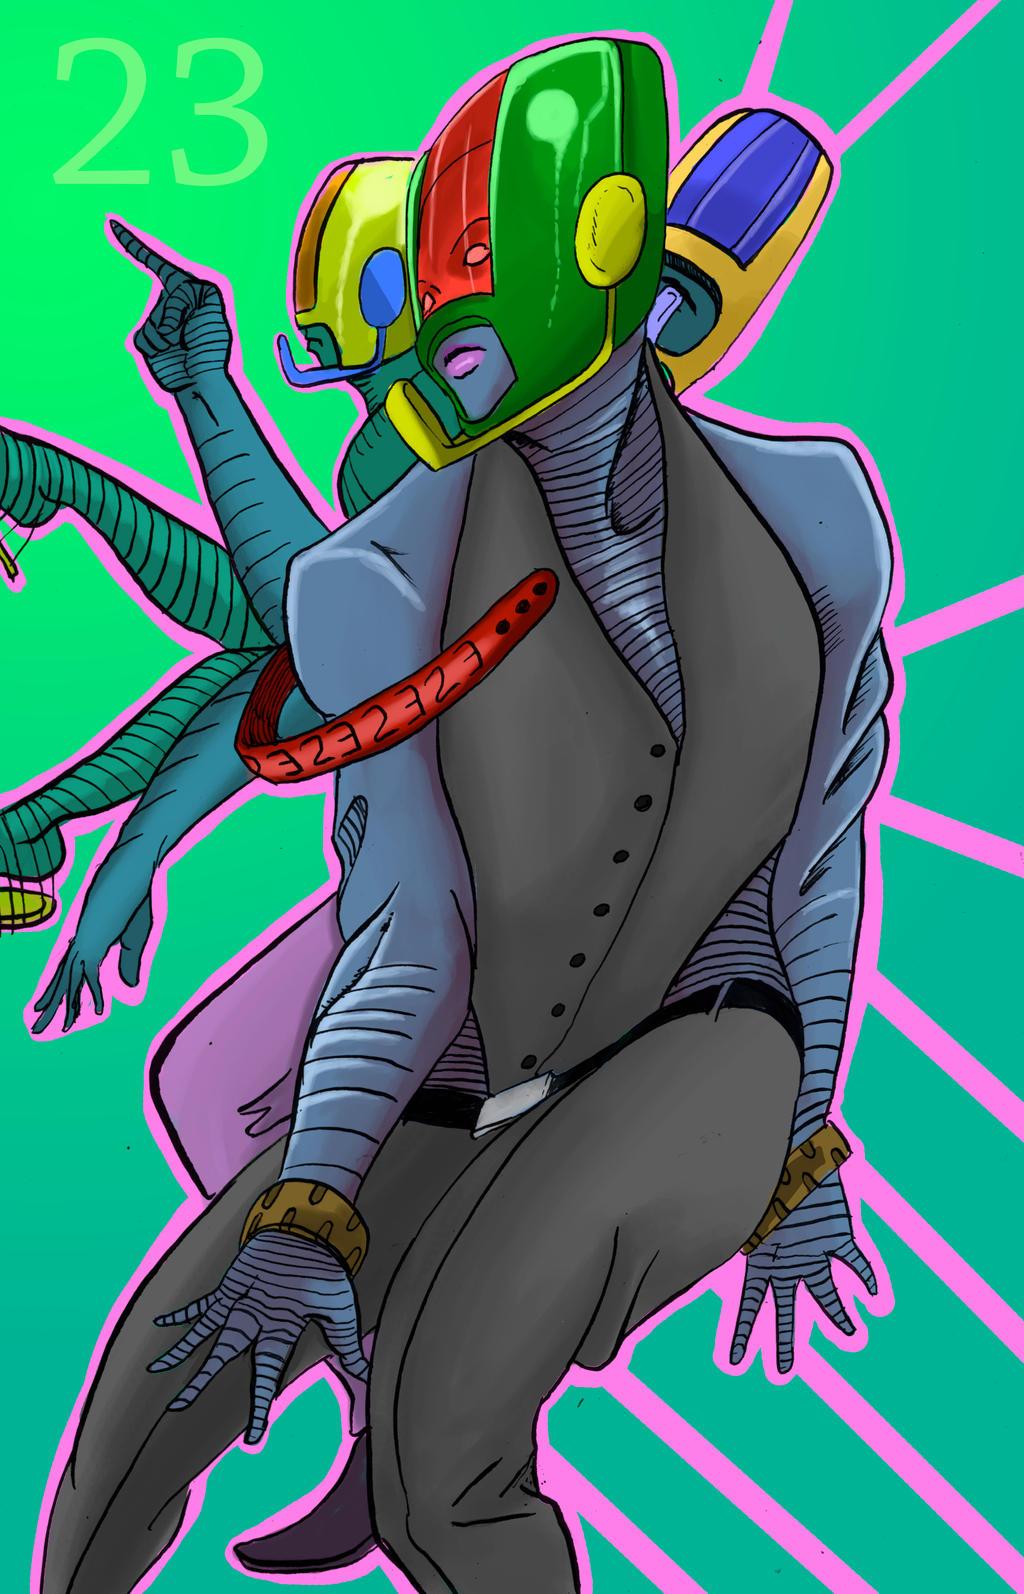 Mister-23's Profile Picture